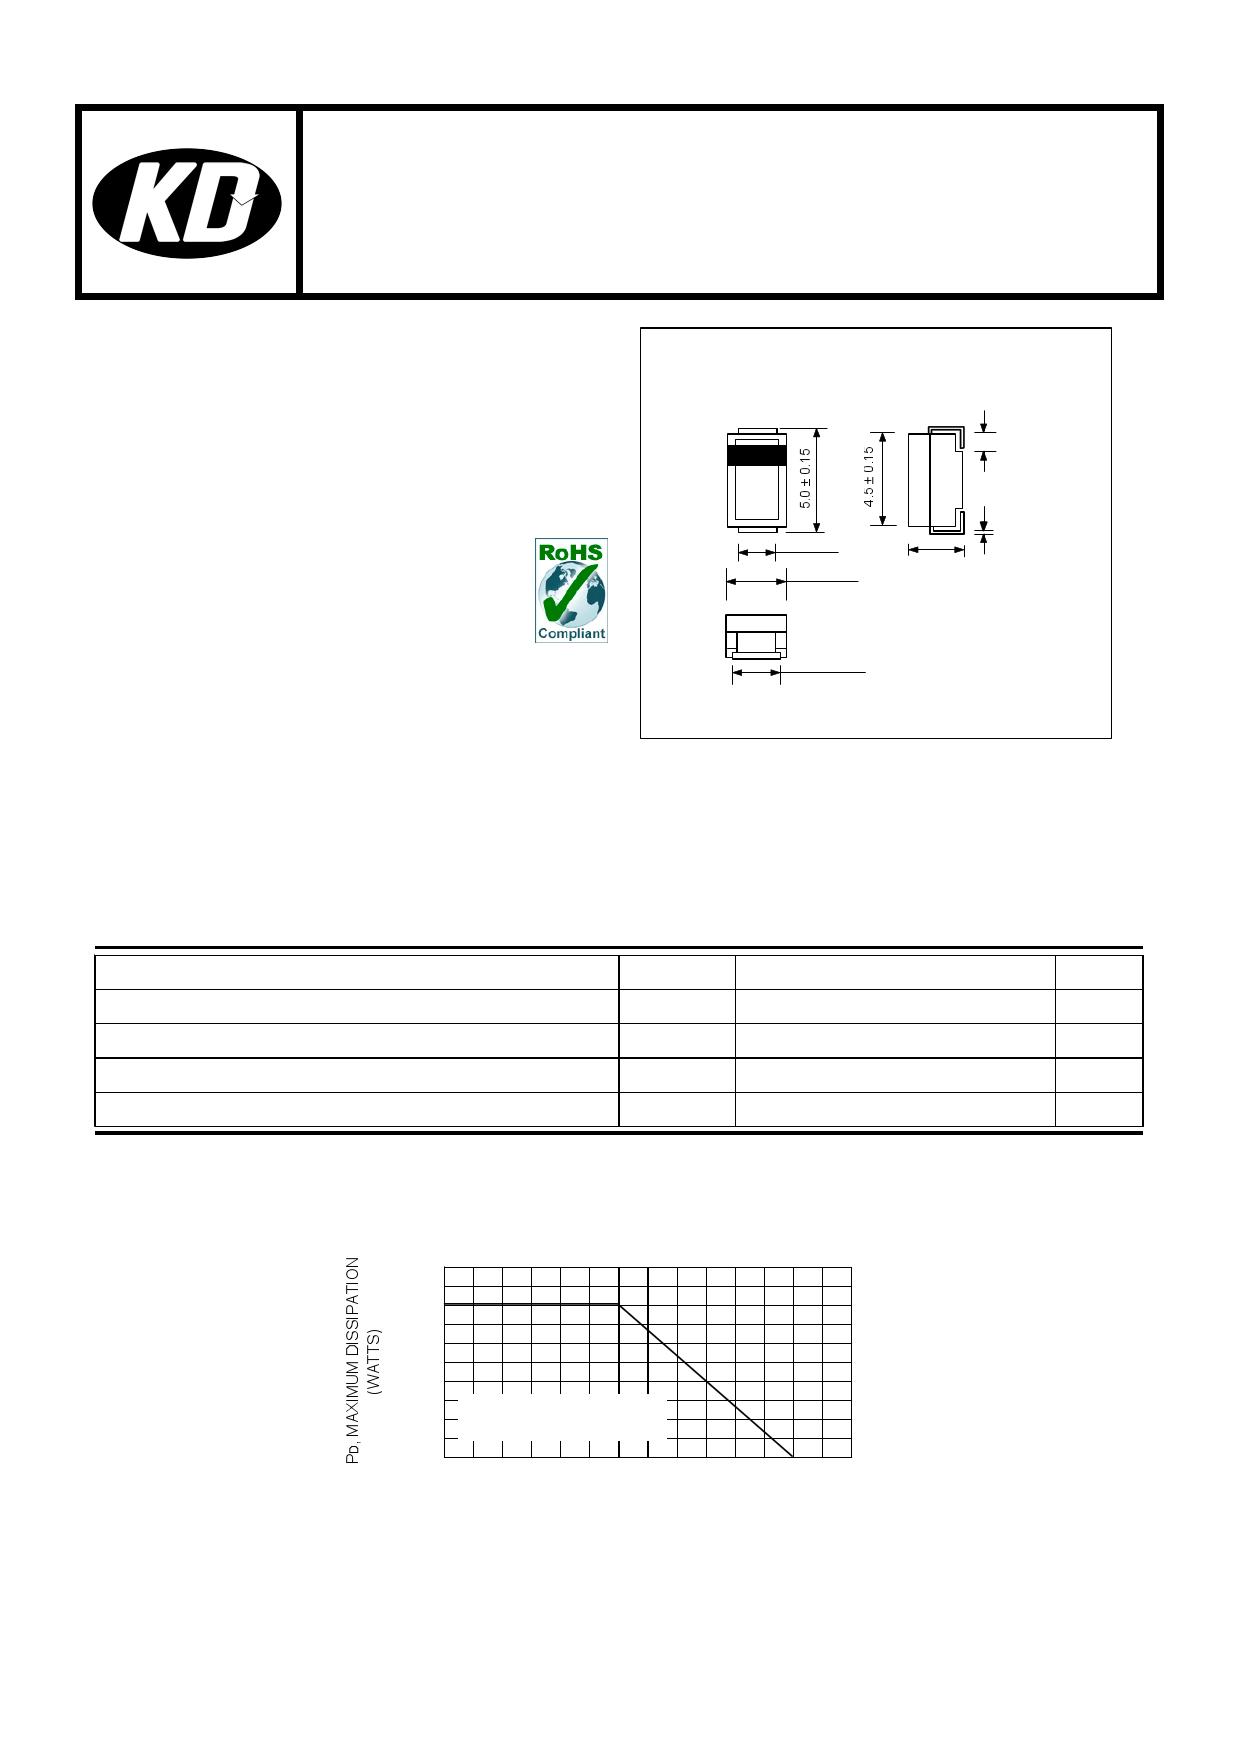 SZ40B3 datasheet pinout pdf